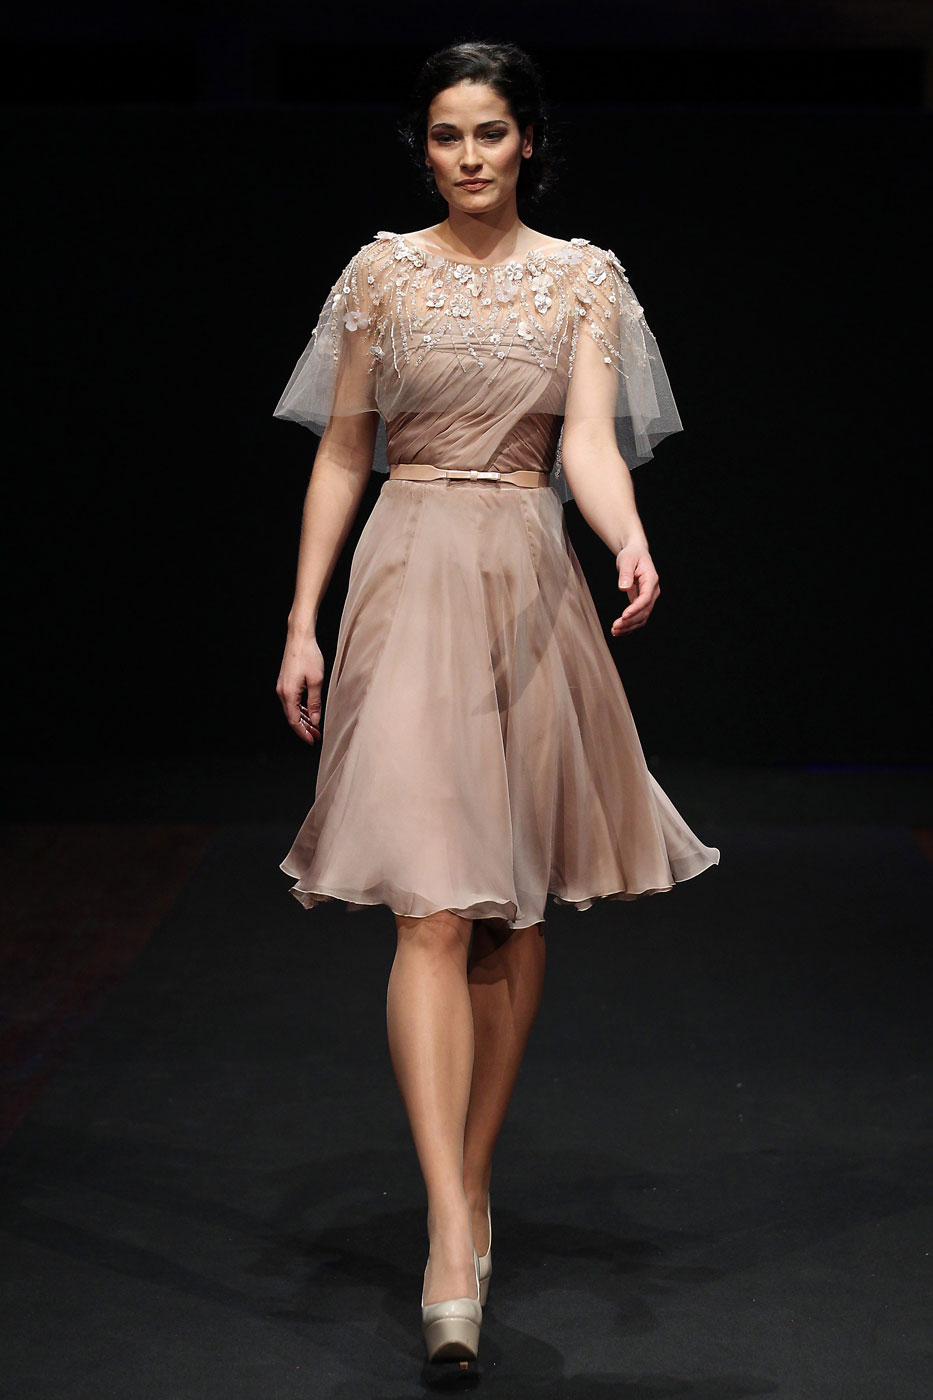 Abed-Mahfouz-fashion-runway-show-haute-couture-paris-spring-2015-the-impression-23